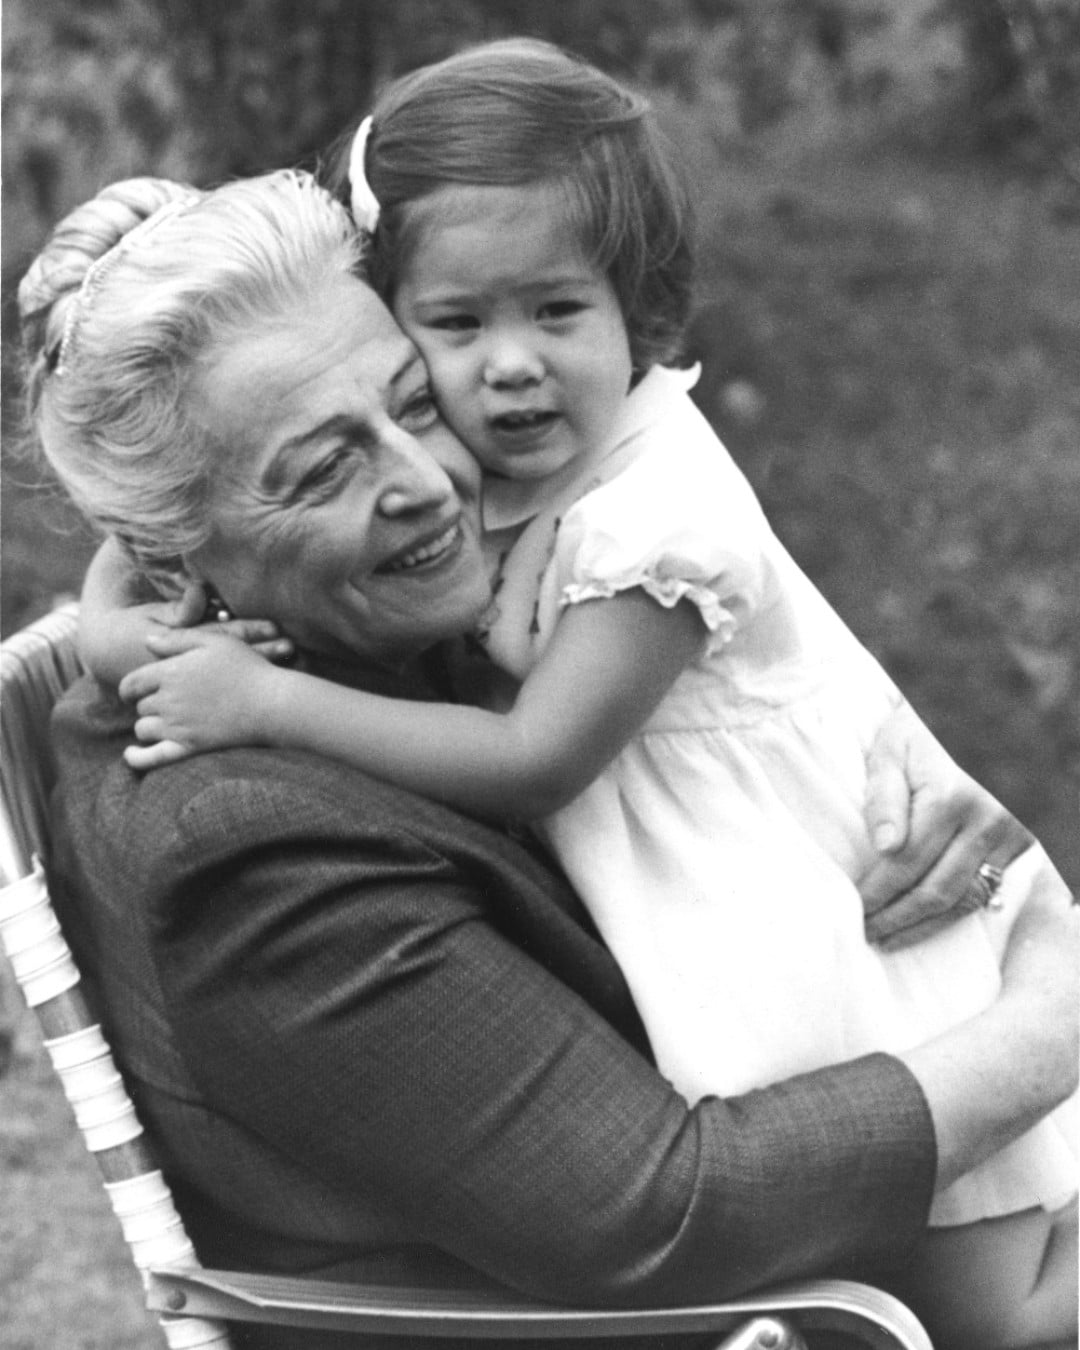 Pearl Buck hugging little girl sitting on her lap